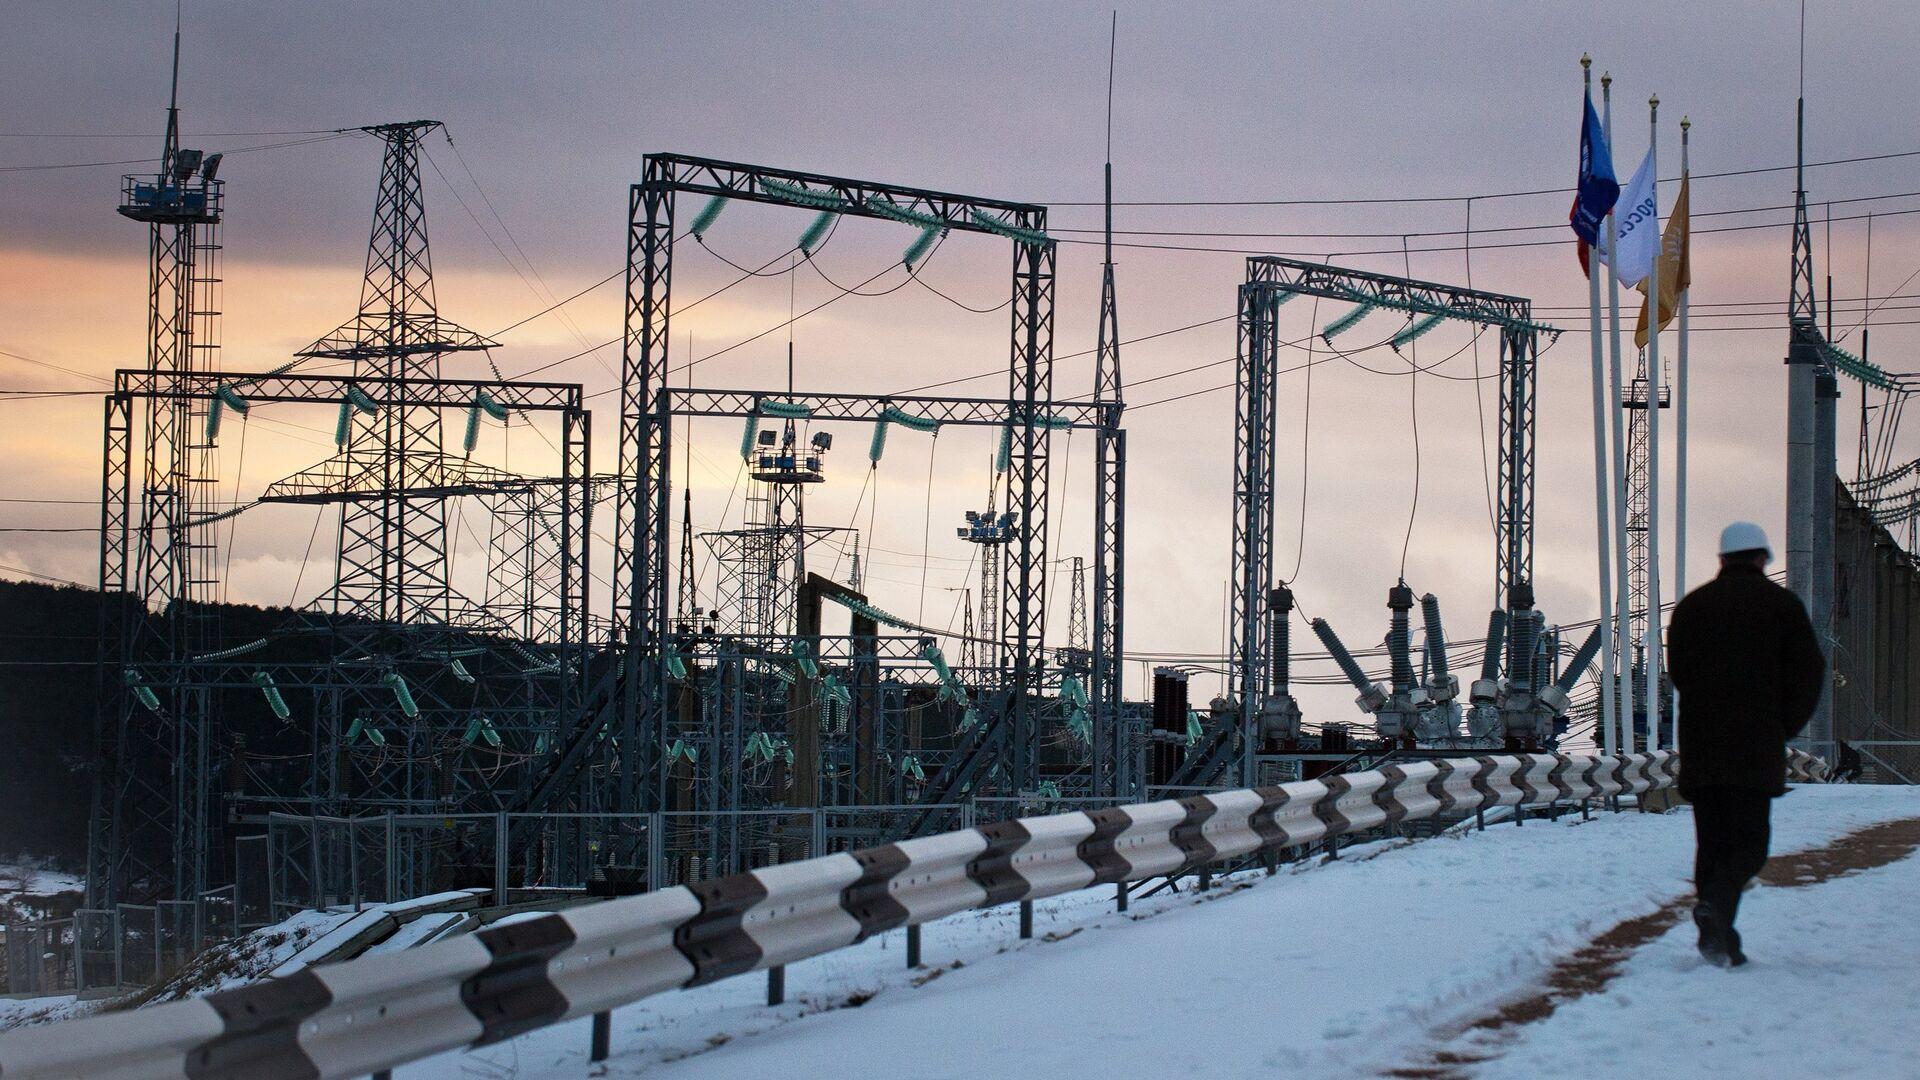 Fifteen mobile gas turbine power plants generate power for Crimea - Sputnik International, 1920, 07.09.2021